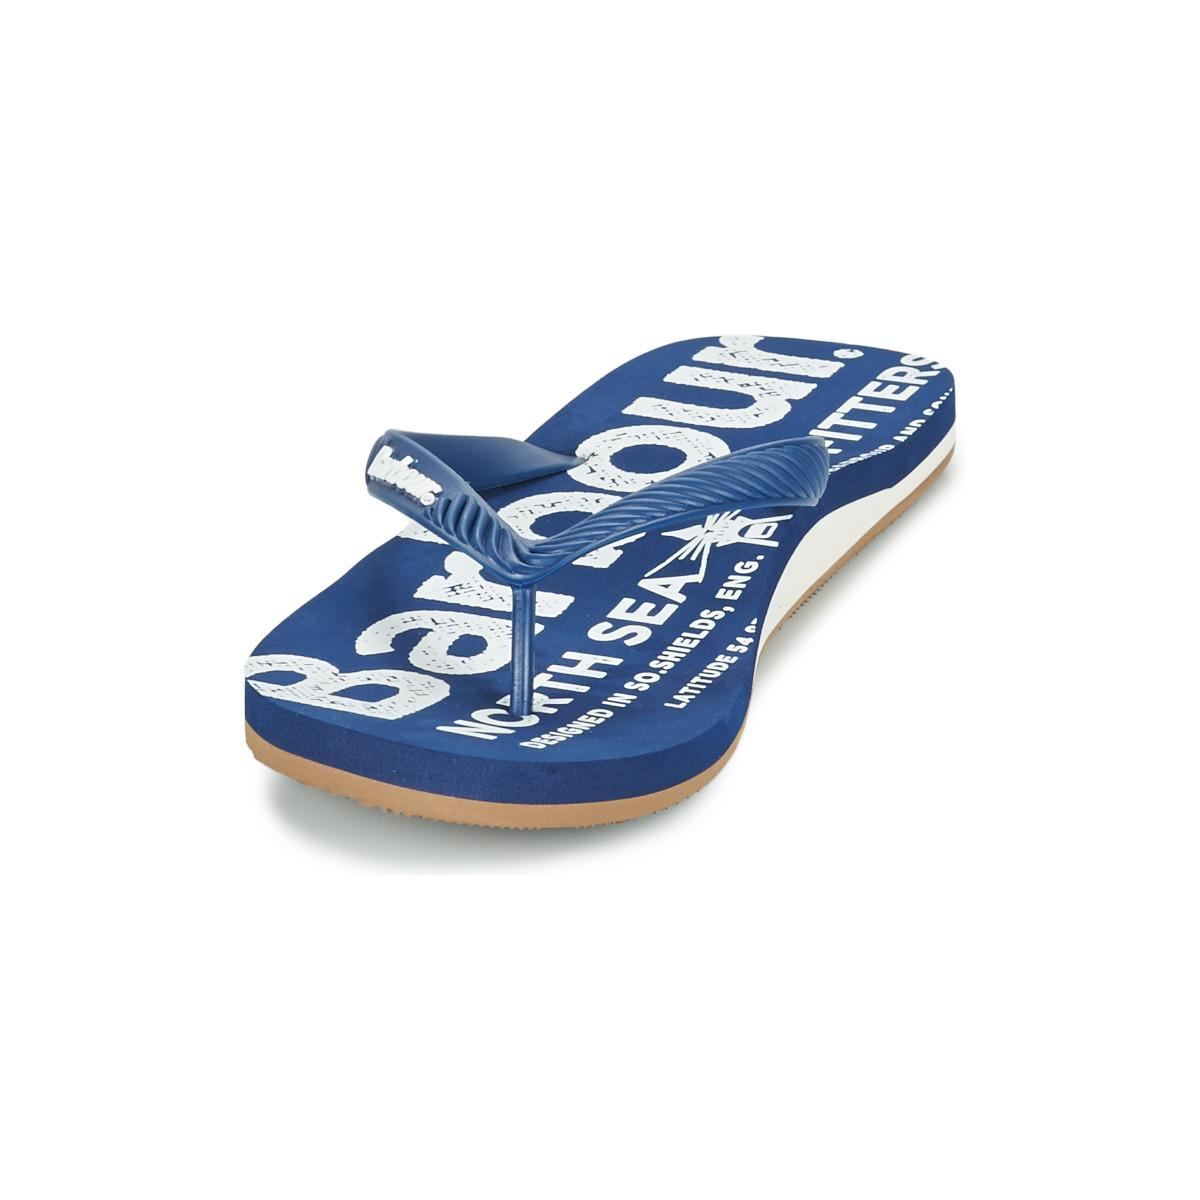 4fbf8c96ded3 Barbour North Sea Beach Sandal Flip Flops   Sandals (shoes) in Blue ...